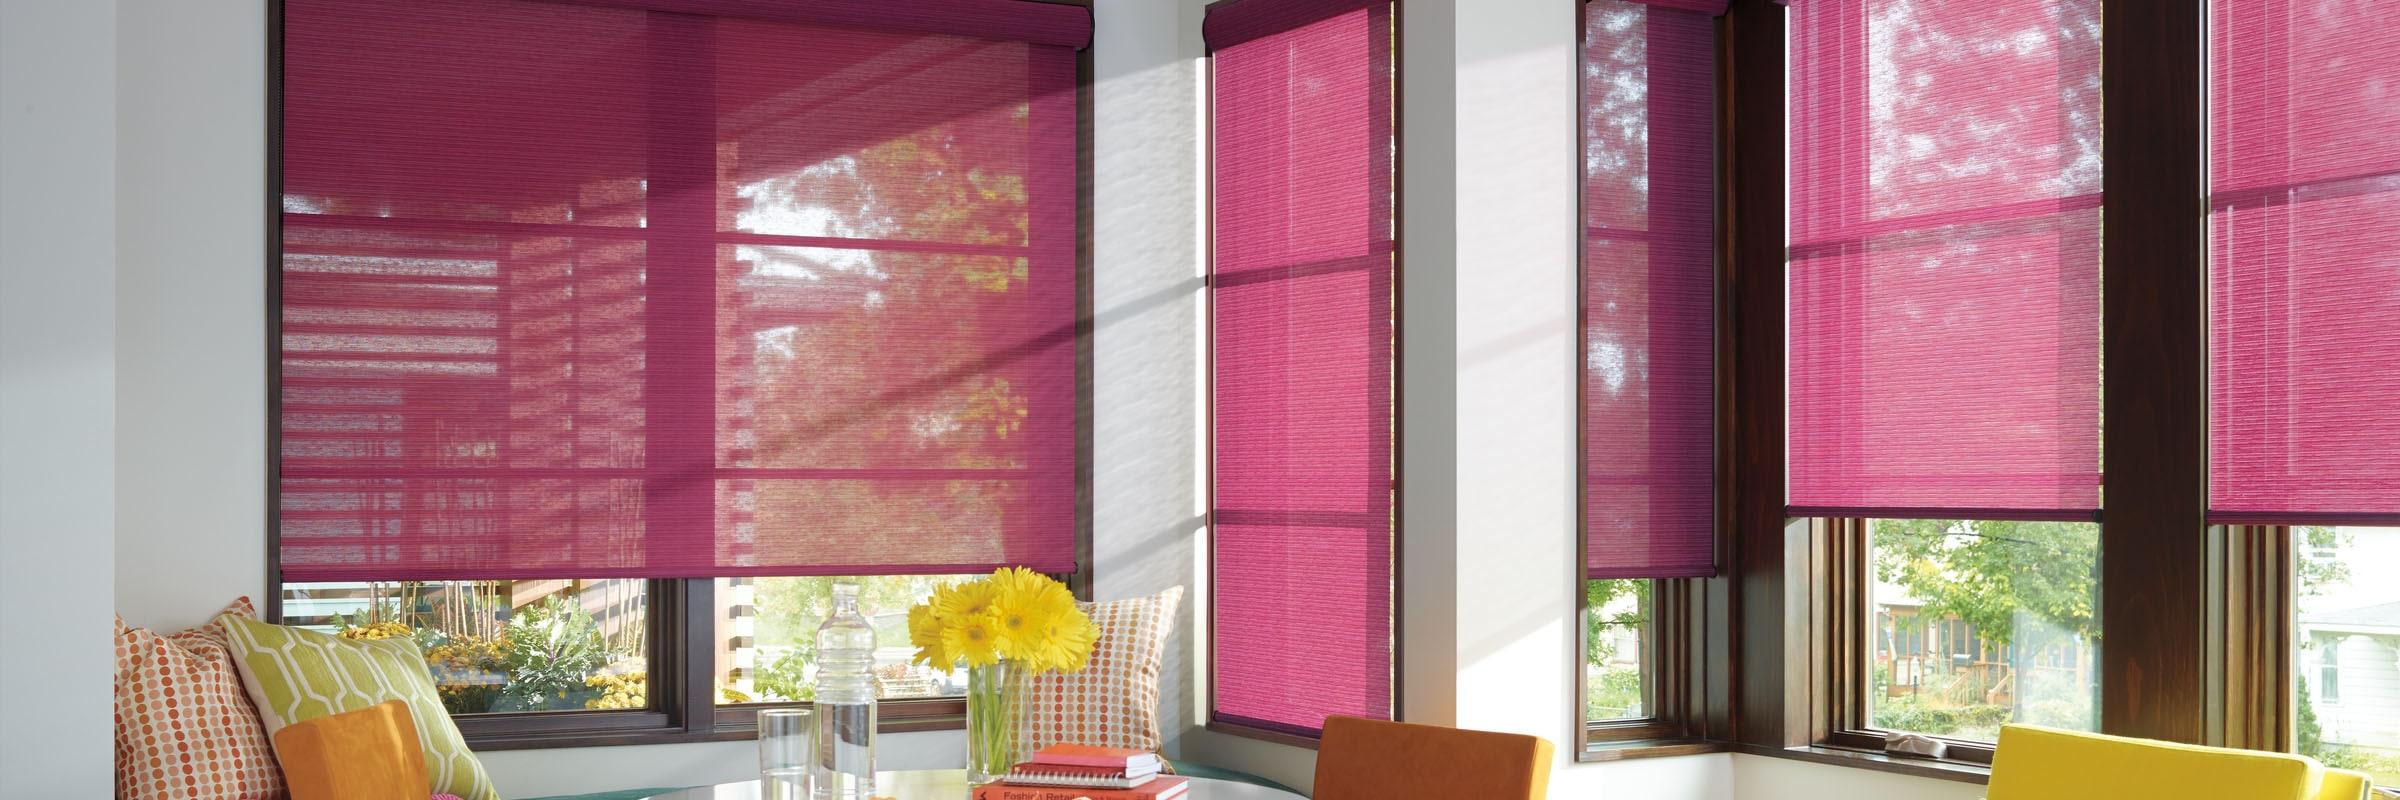 Roller curtains in Alexander Fuschia - Designer Roller Shades